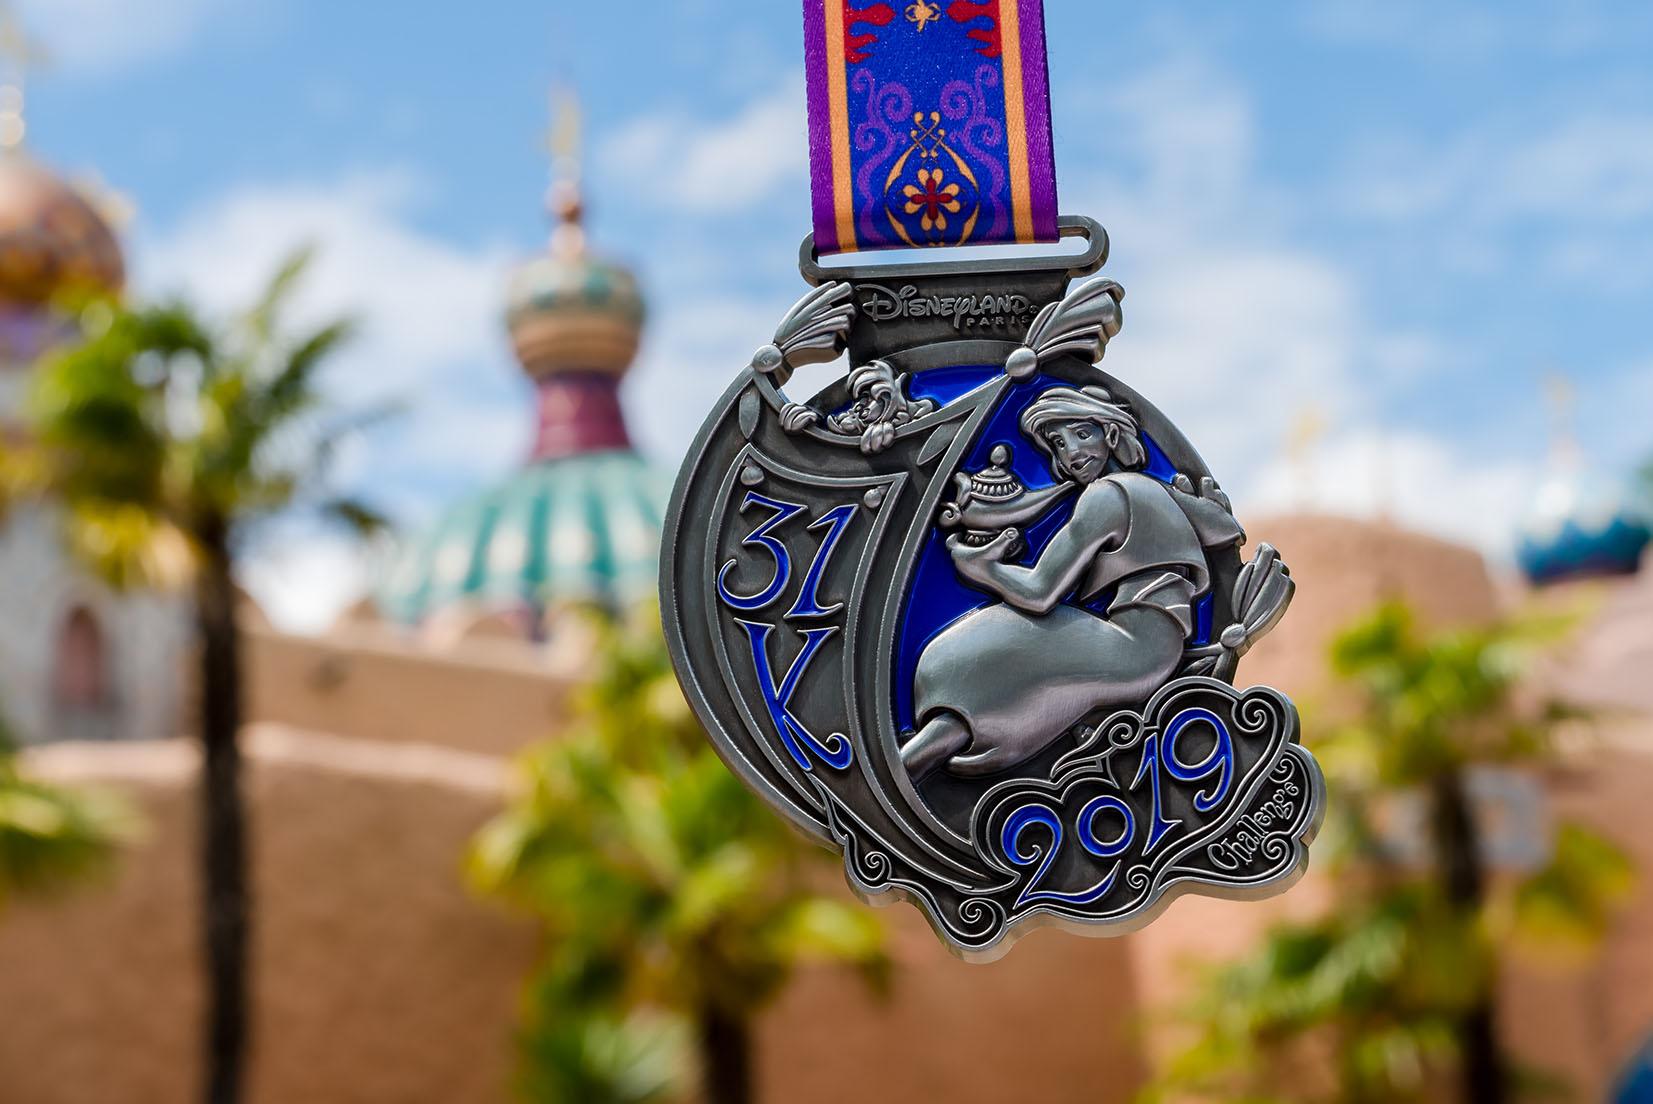 Aladdin, Carpet and Abu on a medal